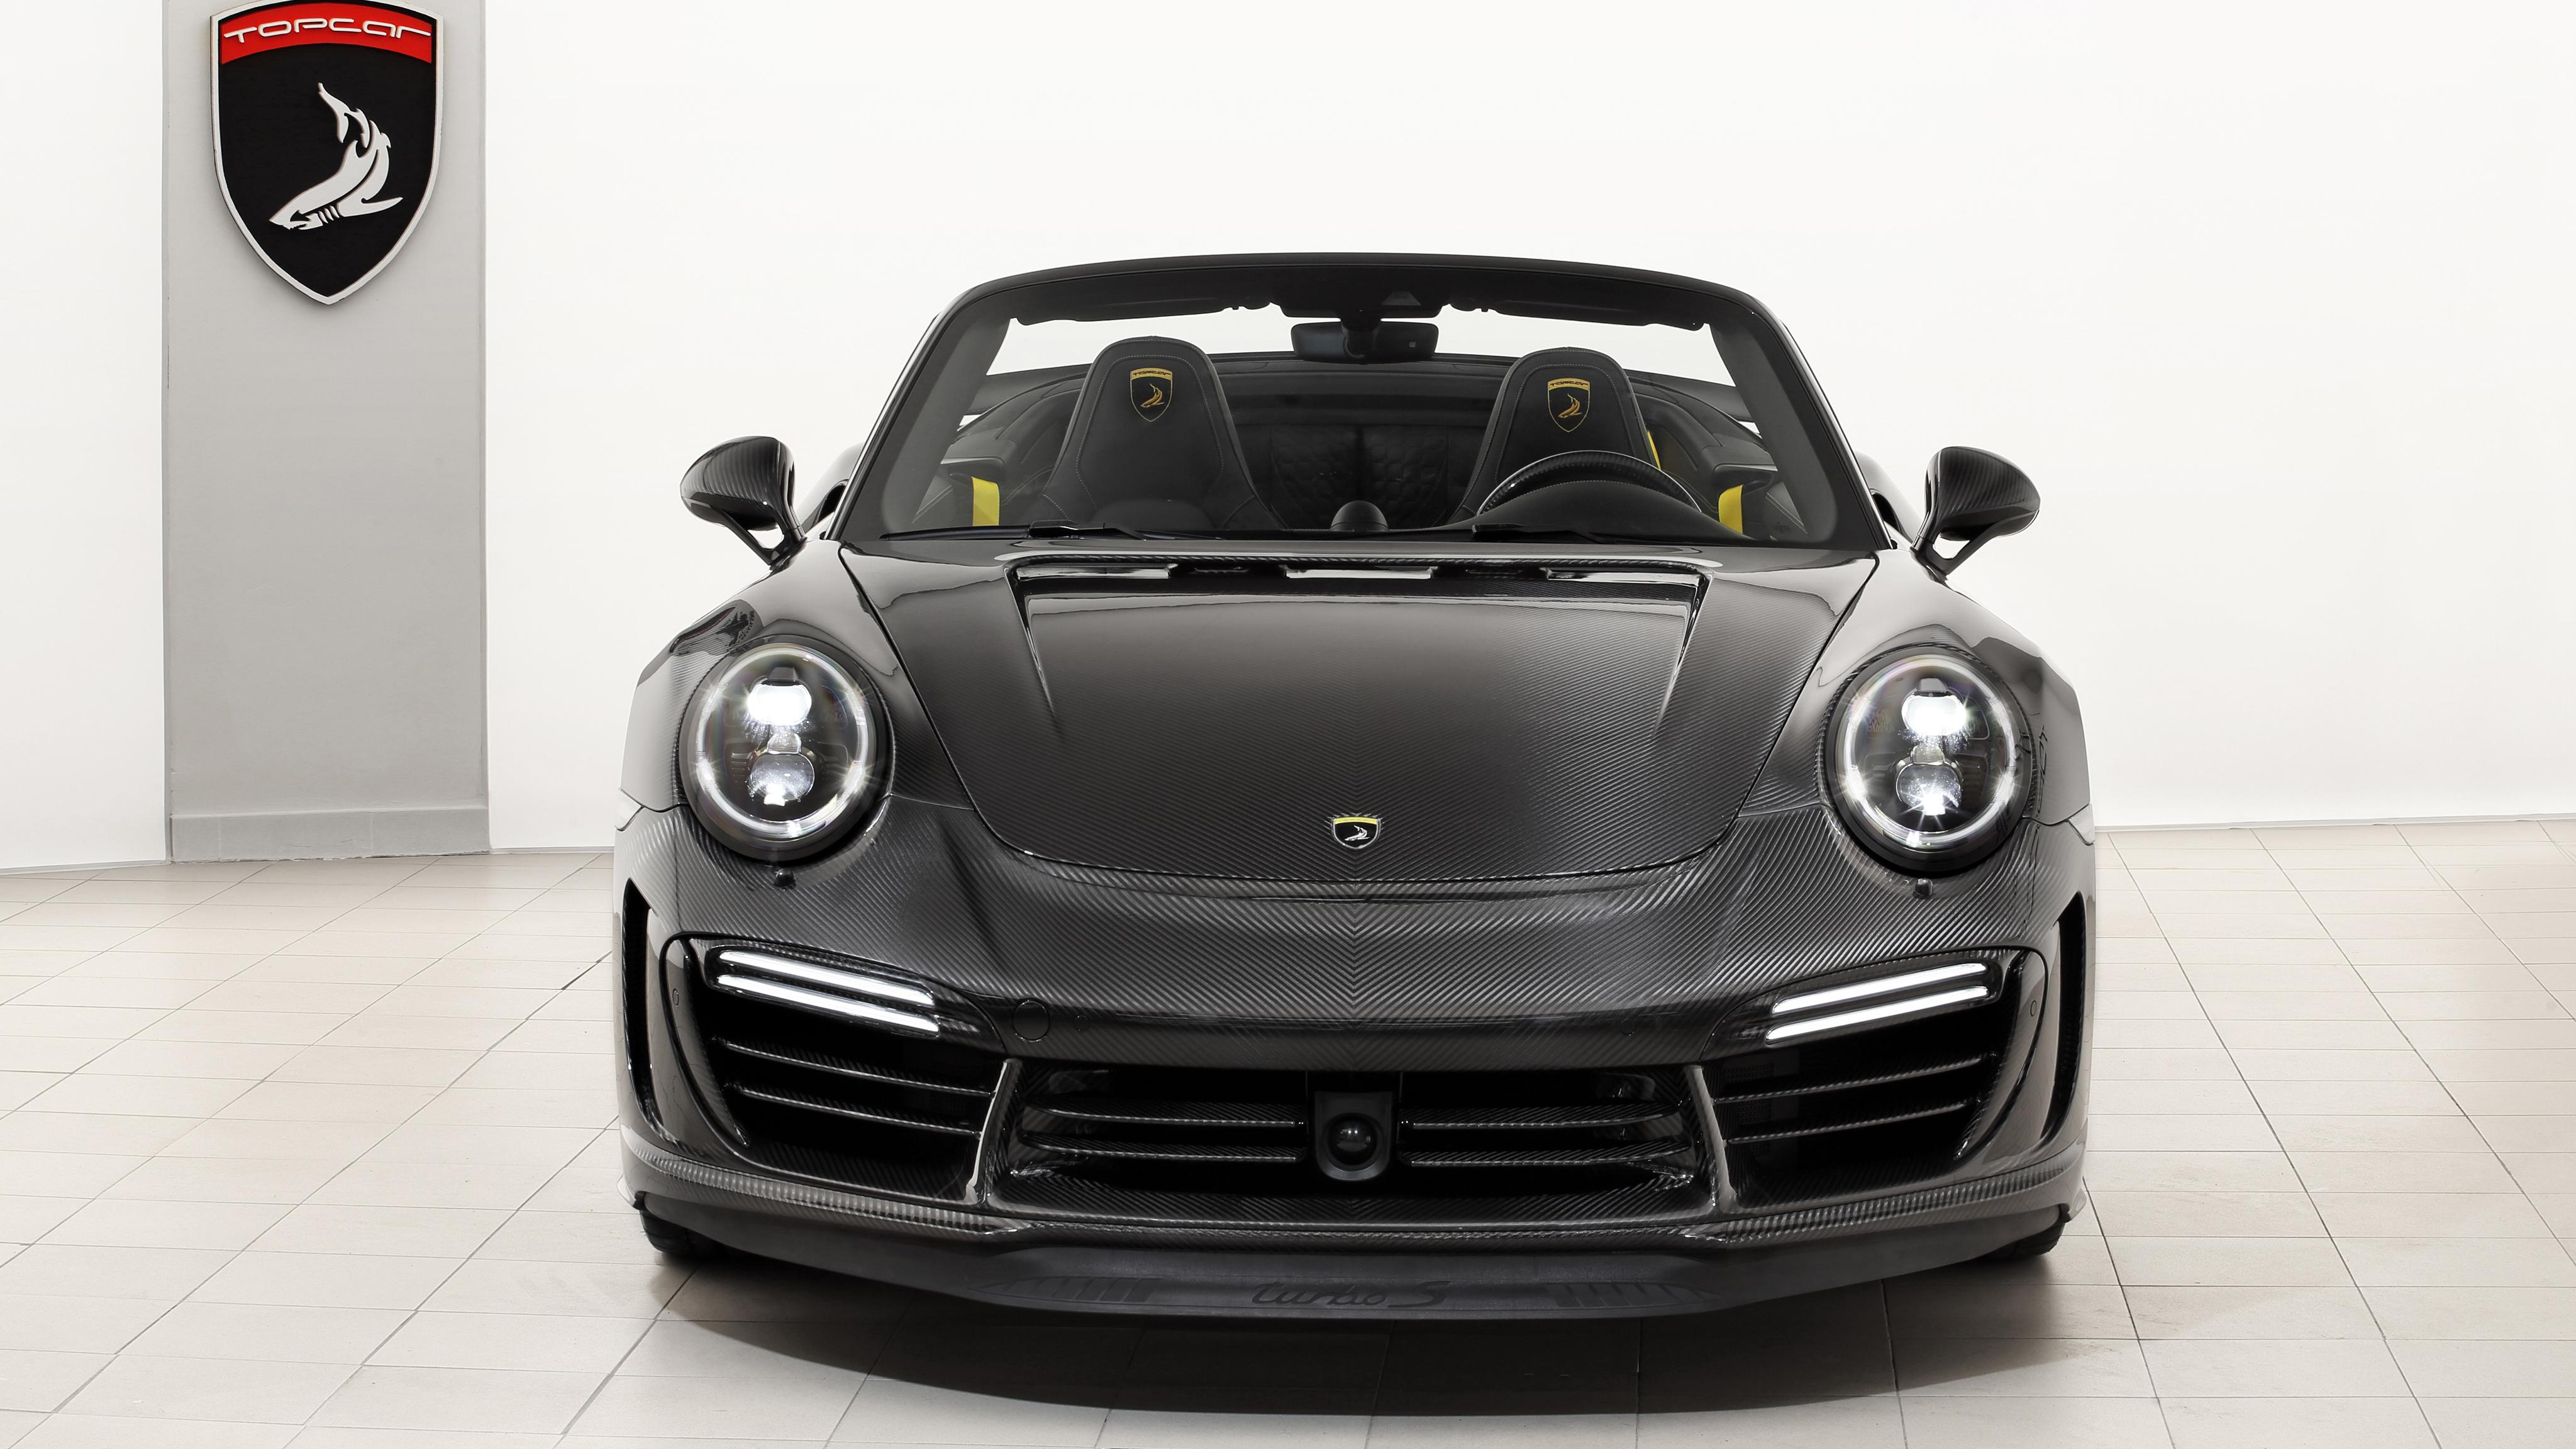 2018 TopCar Porsche 911 Turbo Stinger GTR Cabriolet Carbon